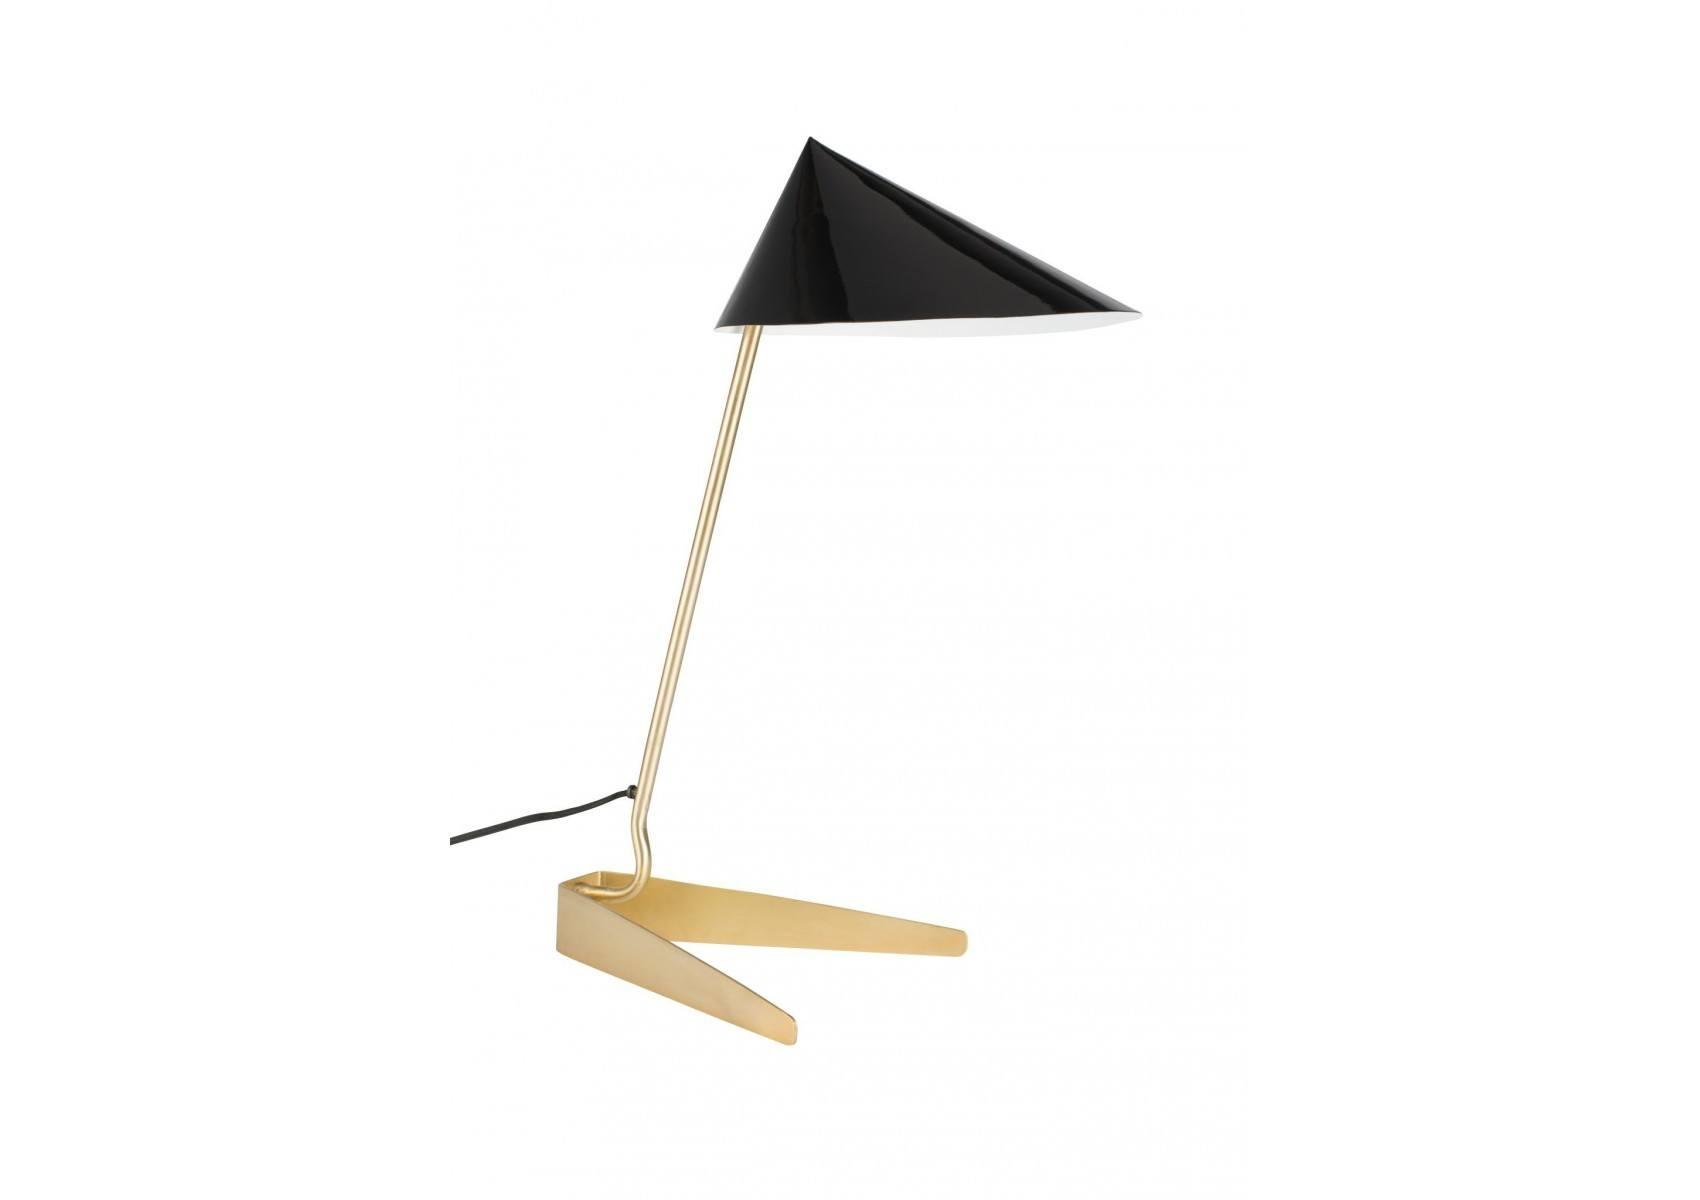 lampe design lizzy blanc et or ou noir et or boite design. Black Bedroom Furniture Sets. Home Design Ideas